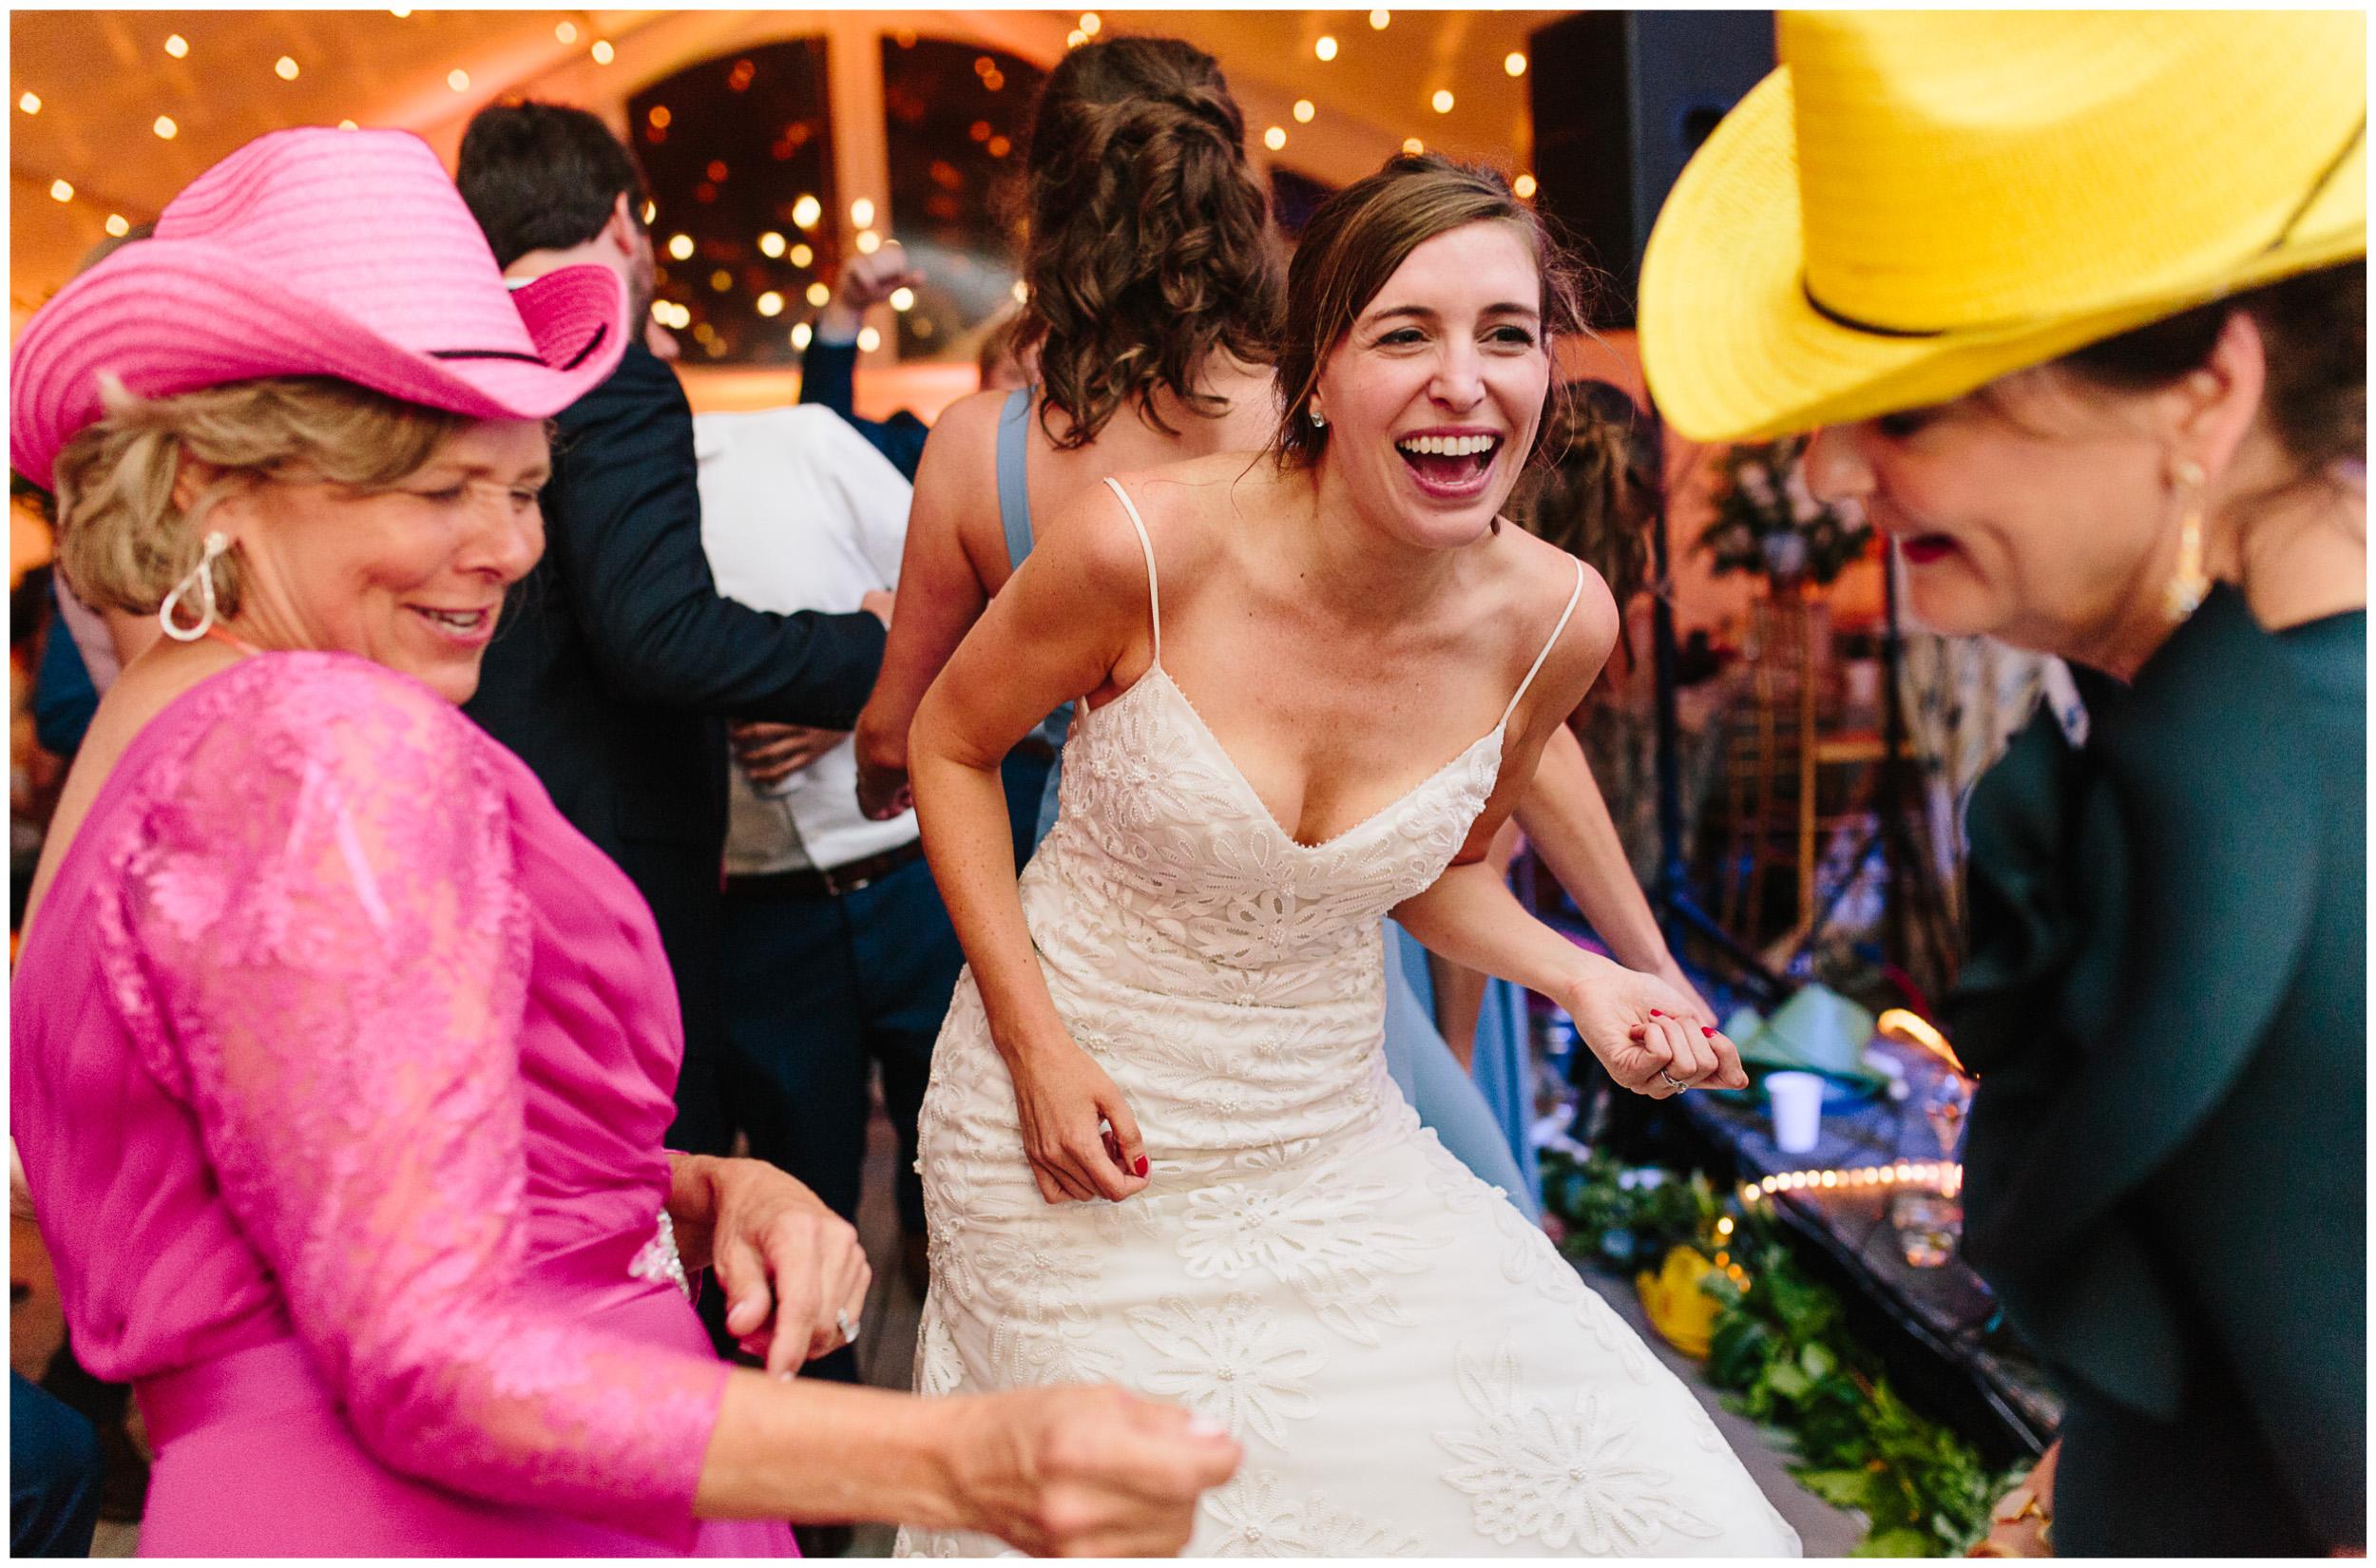 crested_butte_wedding_142.jpg